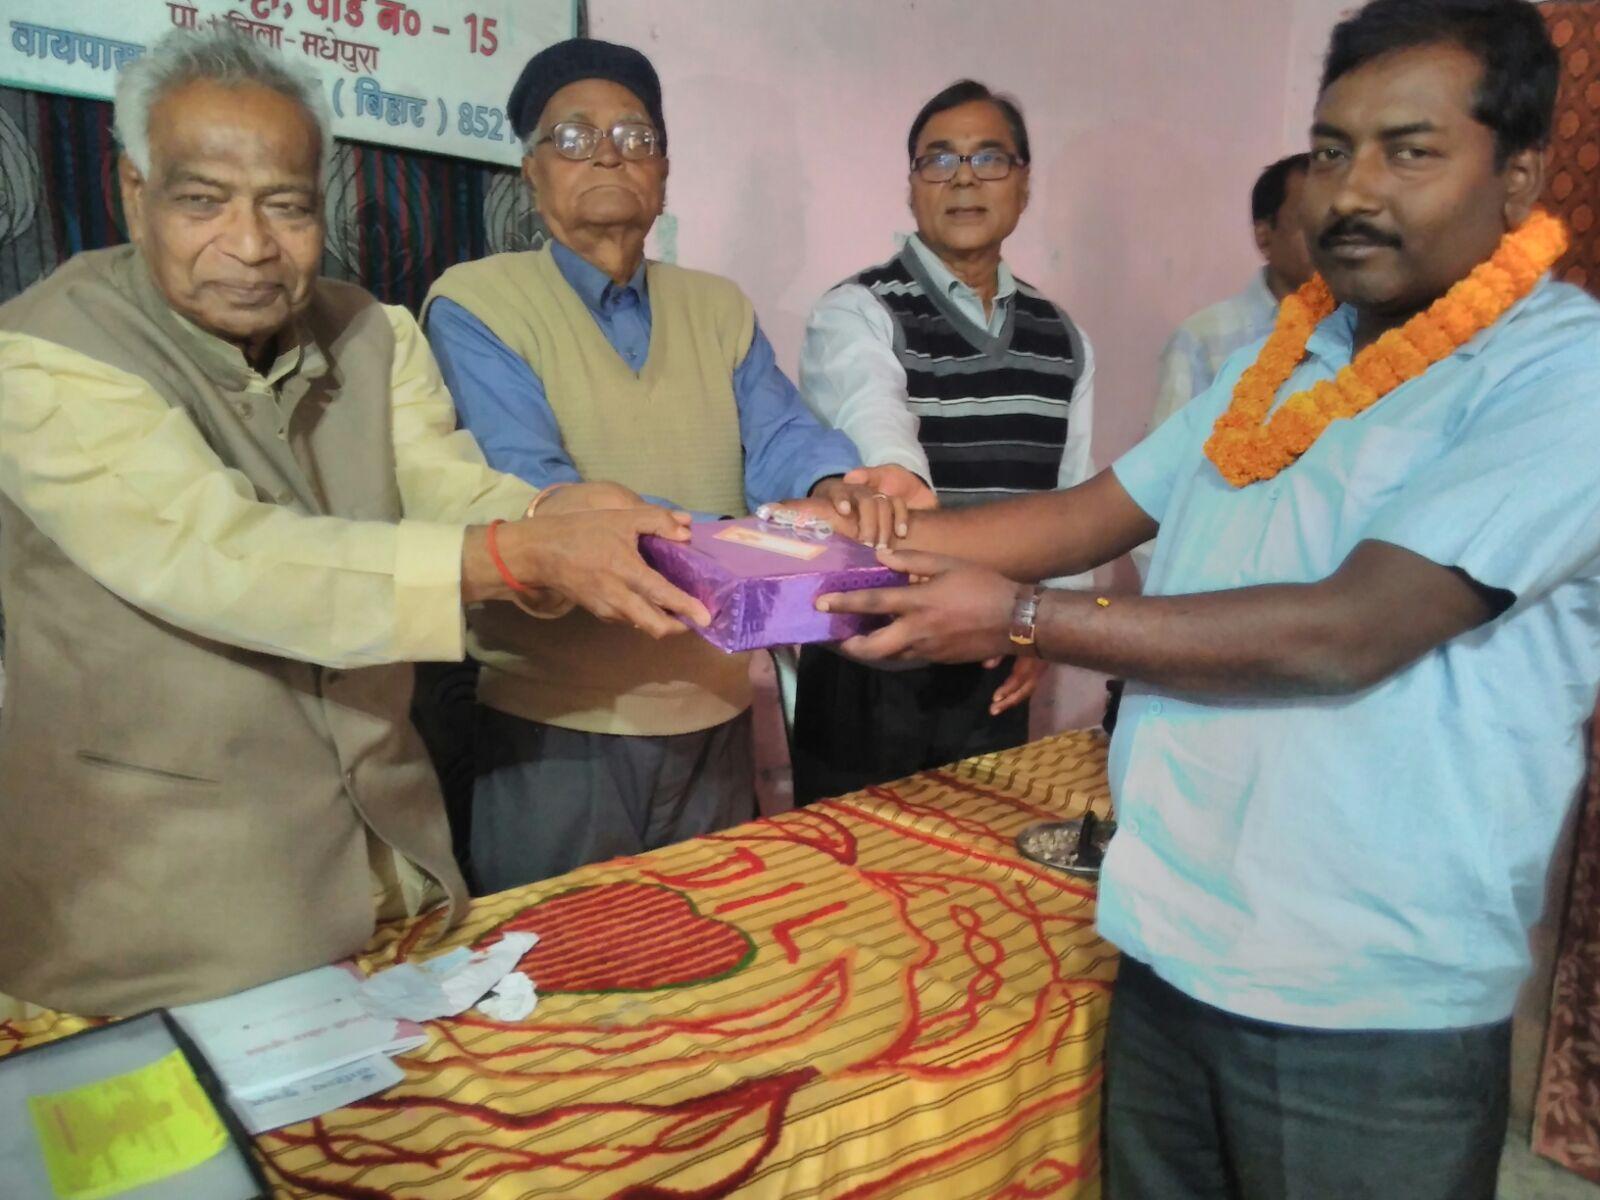 Director of Tulsi Public School Shyamal Kumar Sumitra, the grand performer, receiving honour by former PVC Dr.K.K.Mandal, Kaushiki President Hari Shankar Shrivastav Salabh .